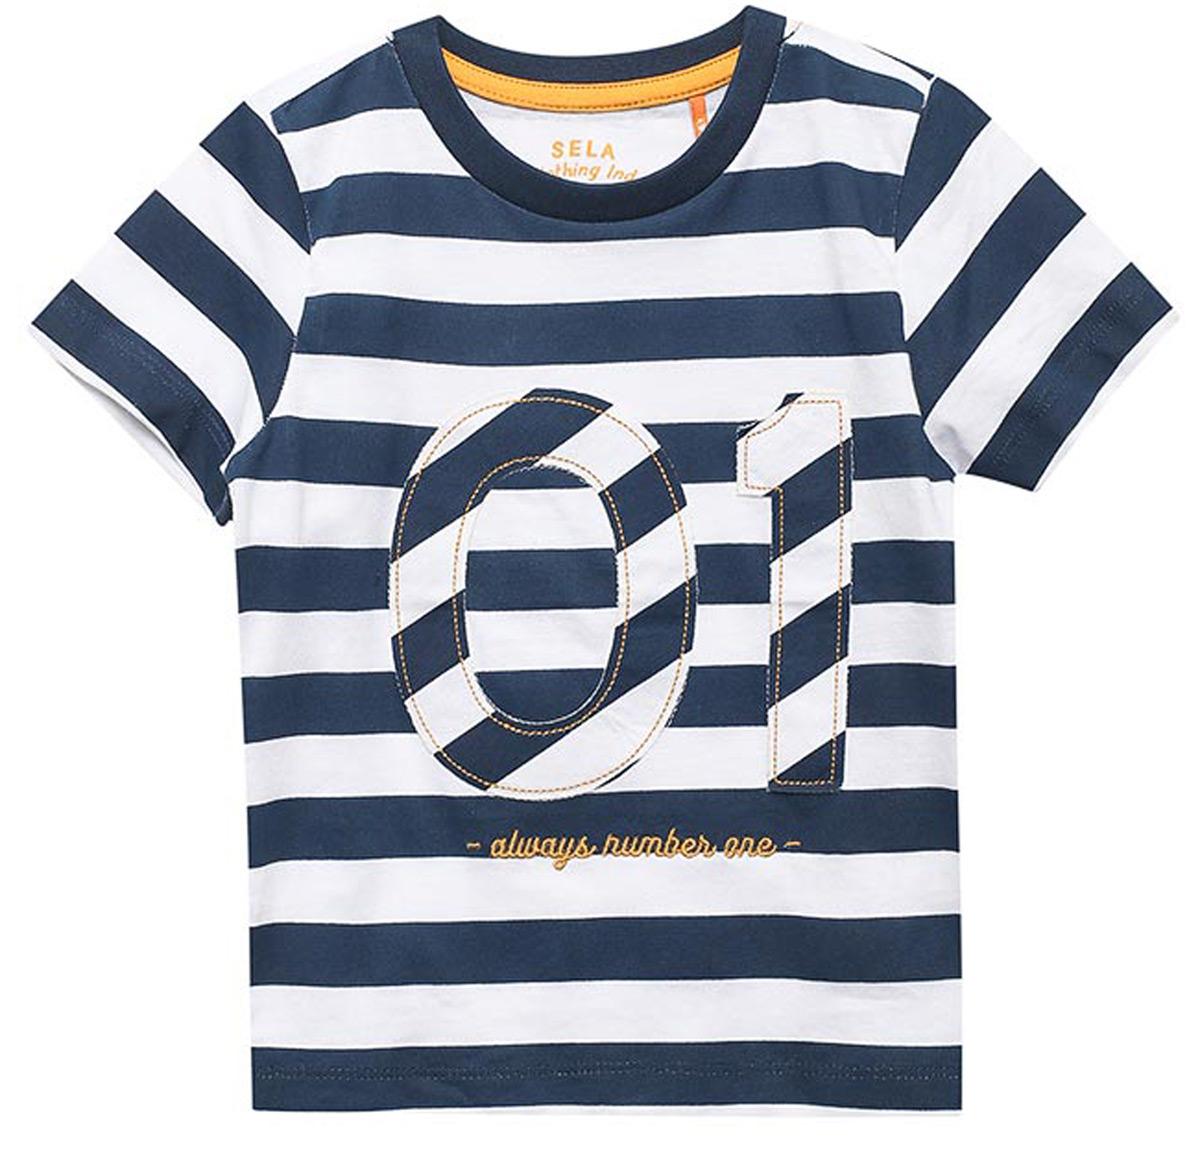 Футболка для мальчика Sela, цвет: темно-синий. Ts-711/538-8121. Размер 110, 5 лет